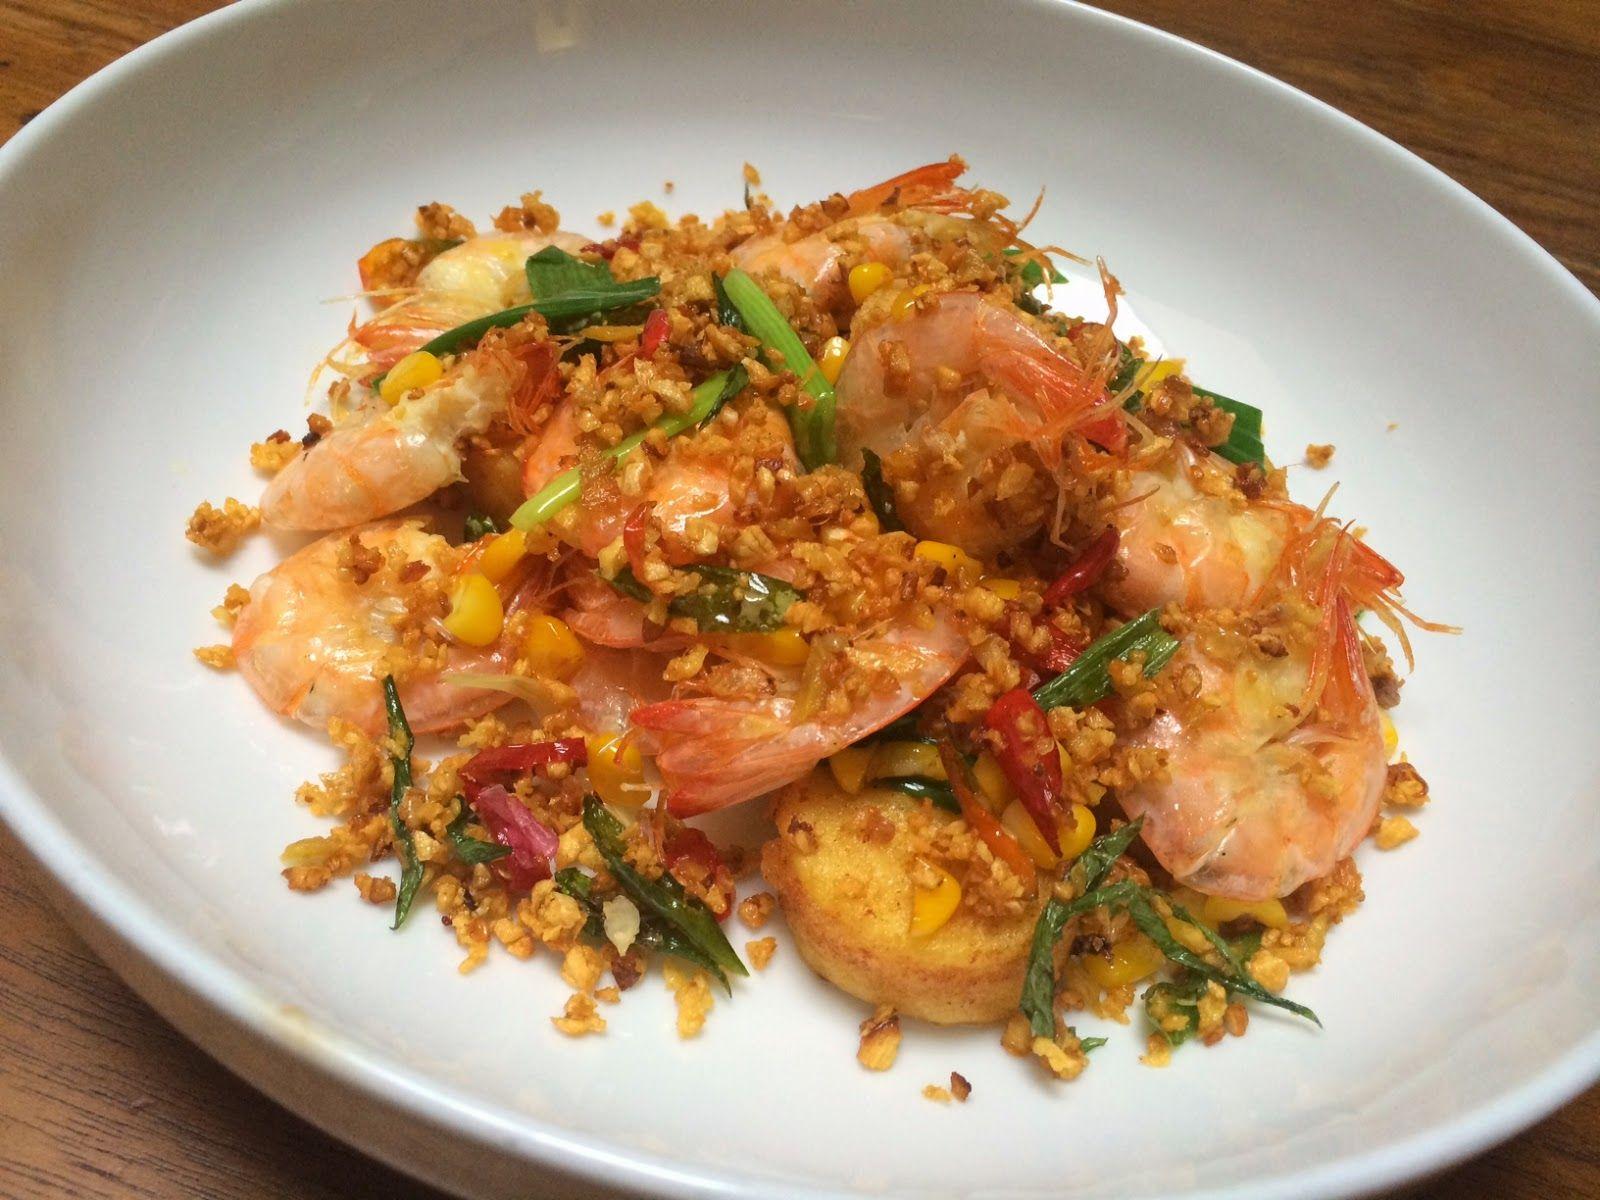 Easy Cooking With Omih Resep Udang Crispy Garlic Resep Udang Memasak Masakan Simpel